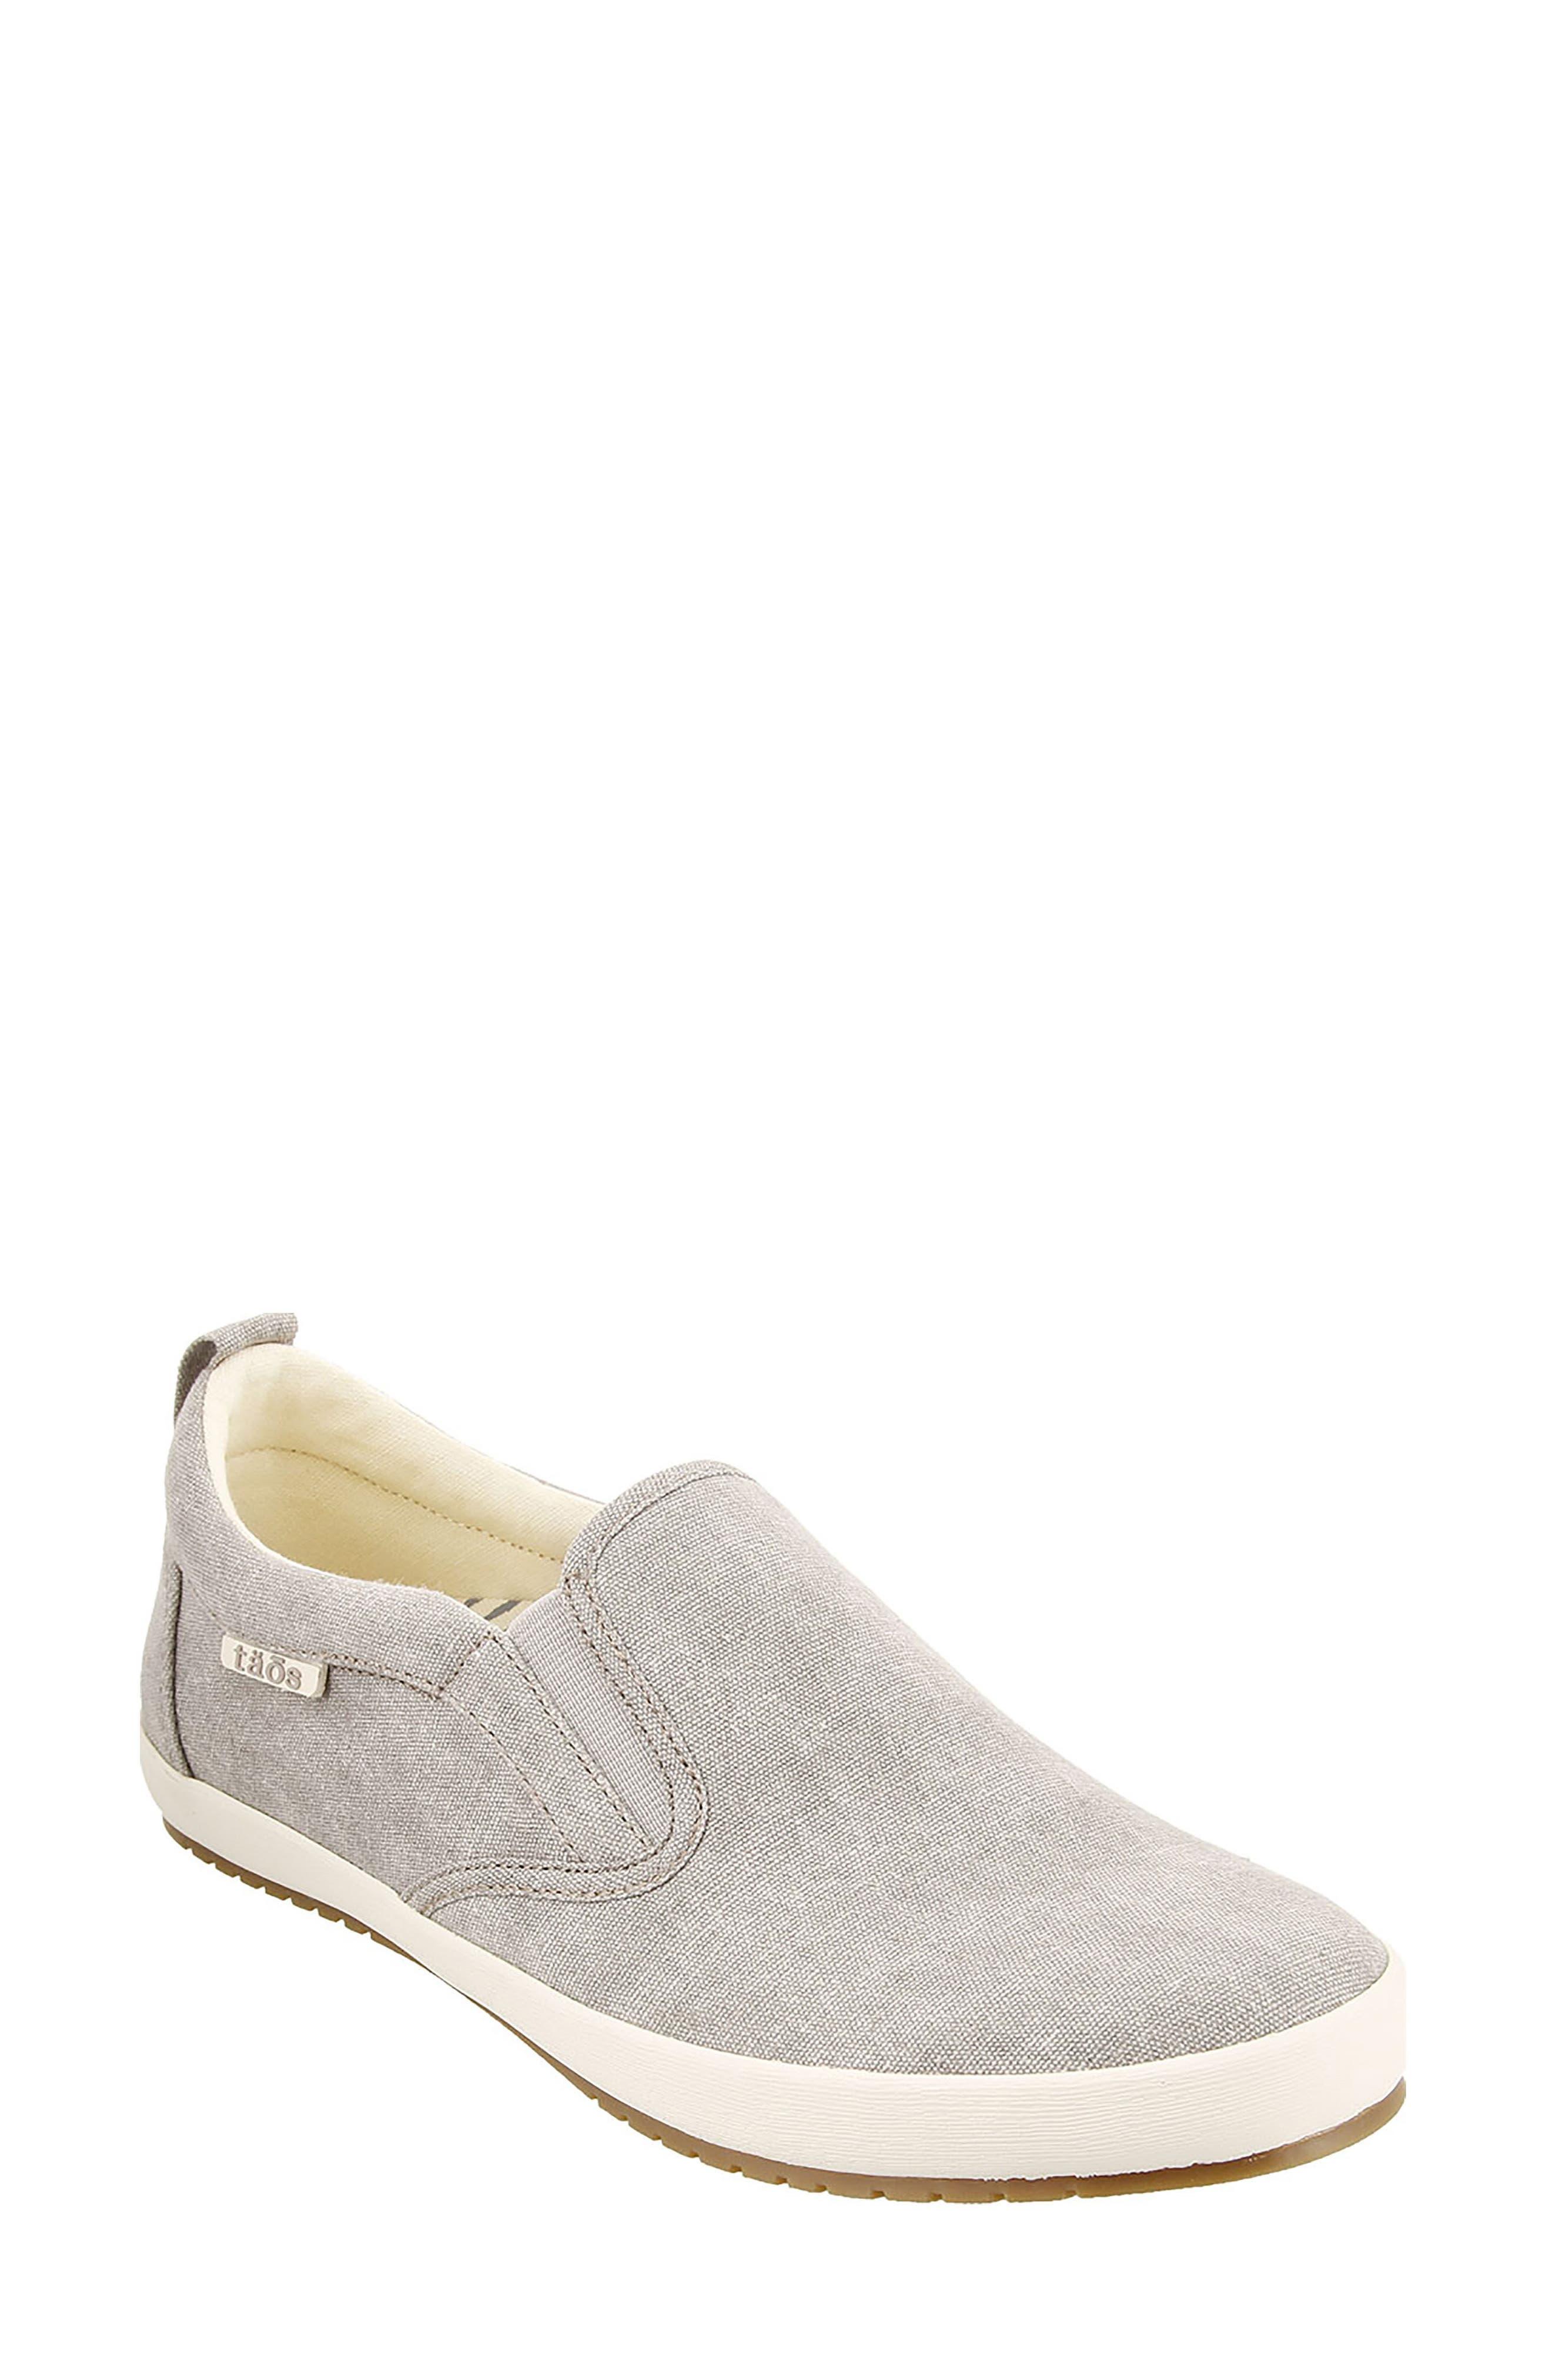 Main Image - Taos Dandy Slip-On Sneaker (Women)